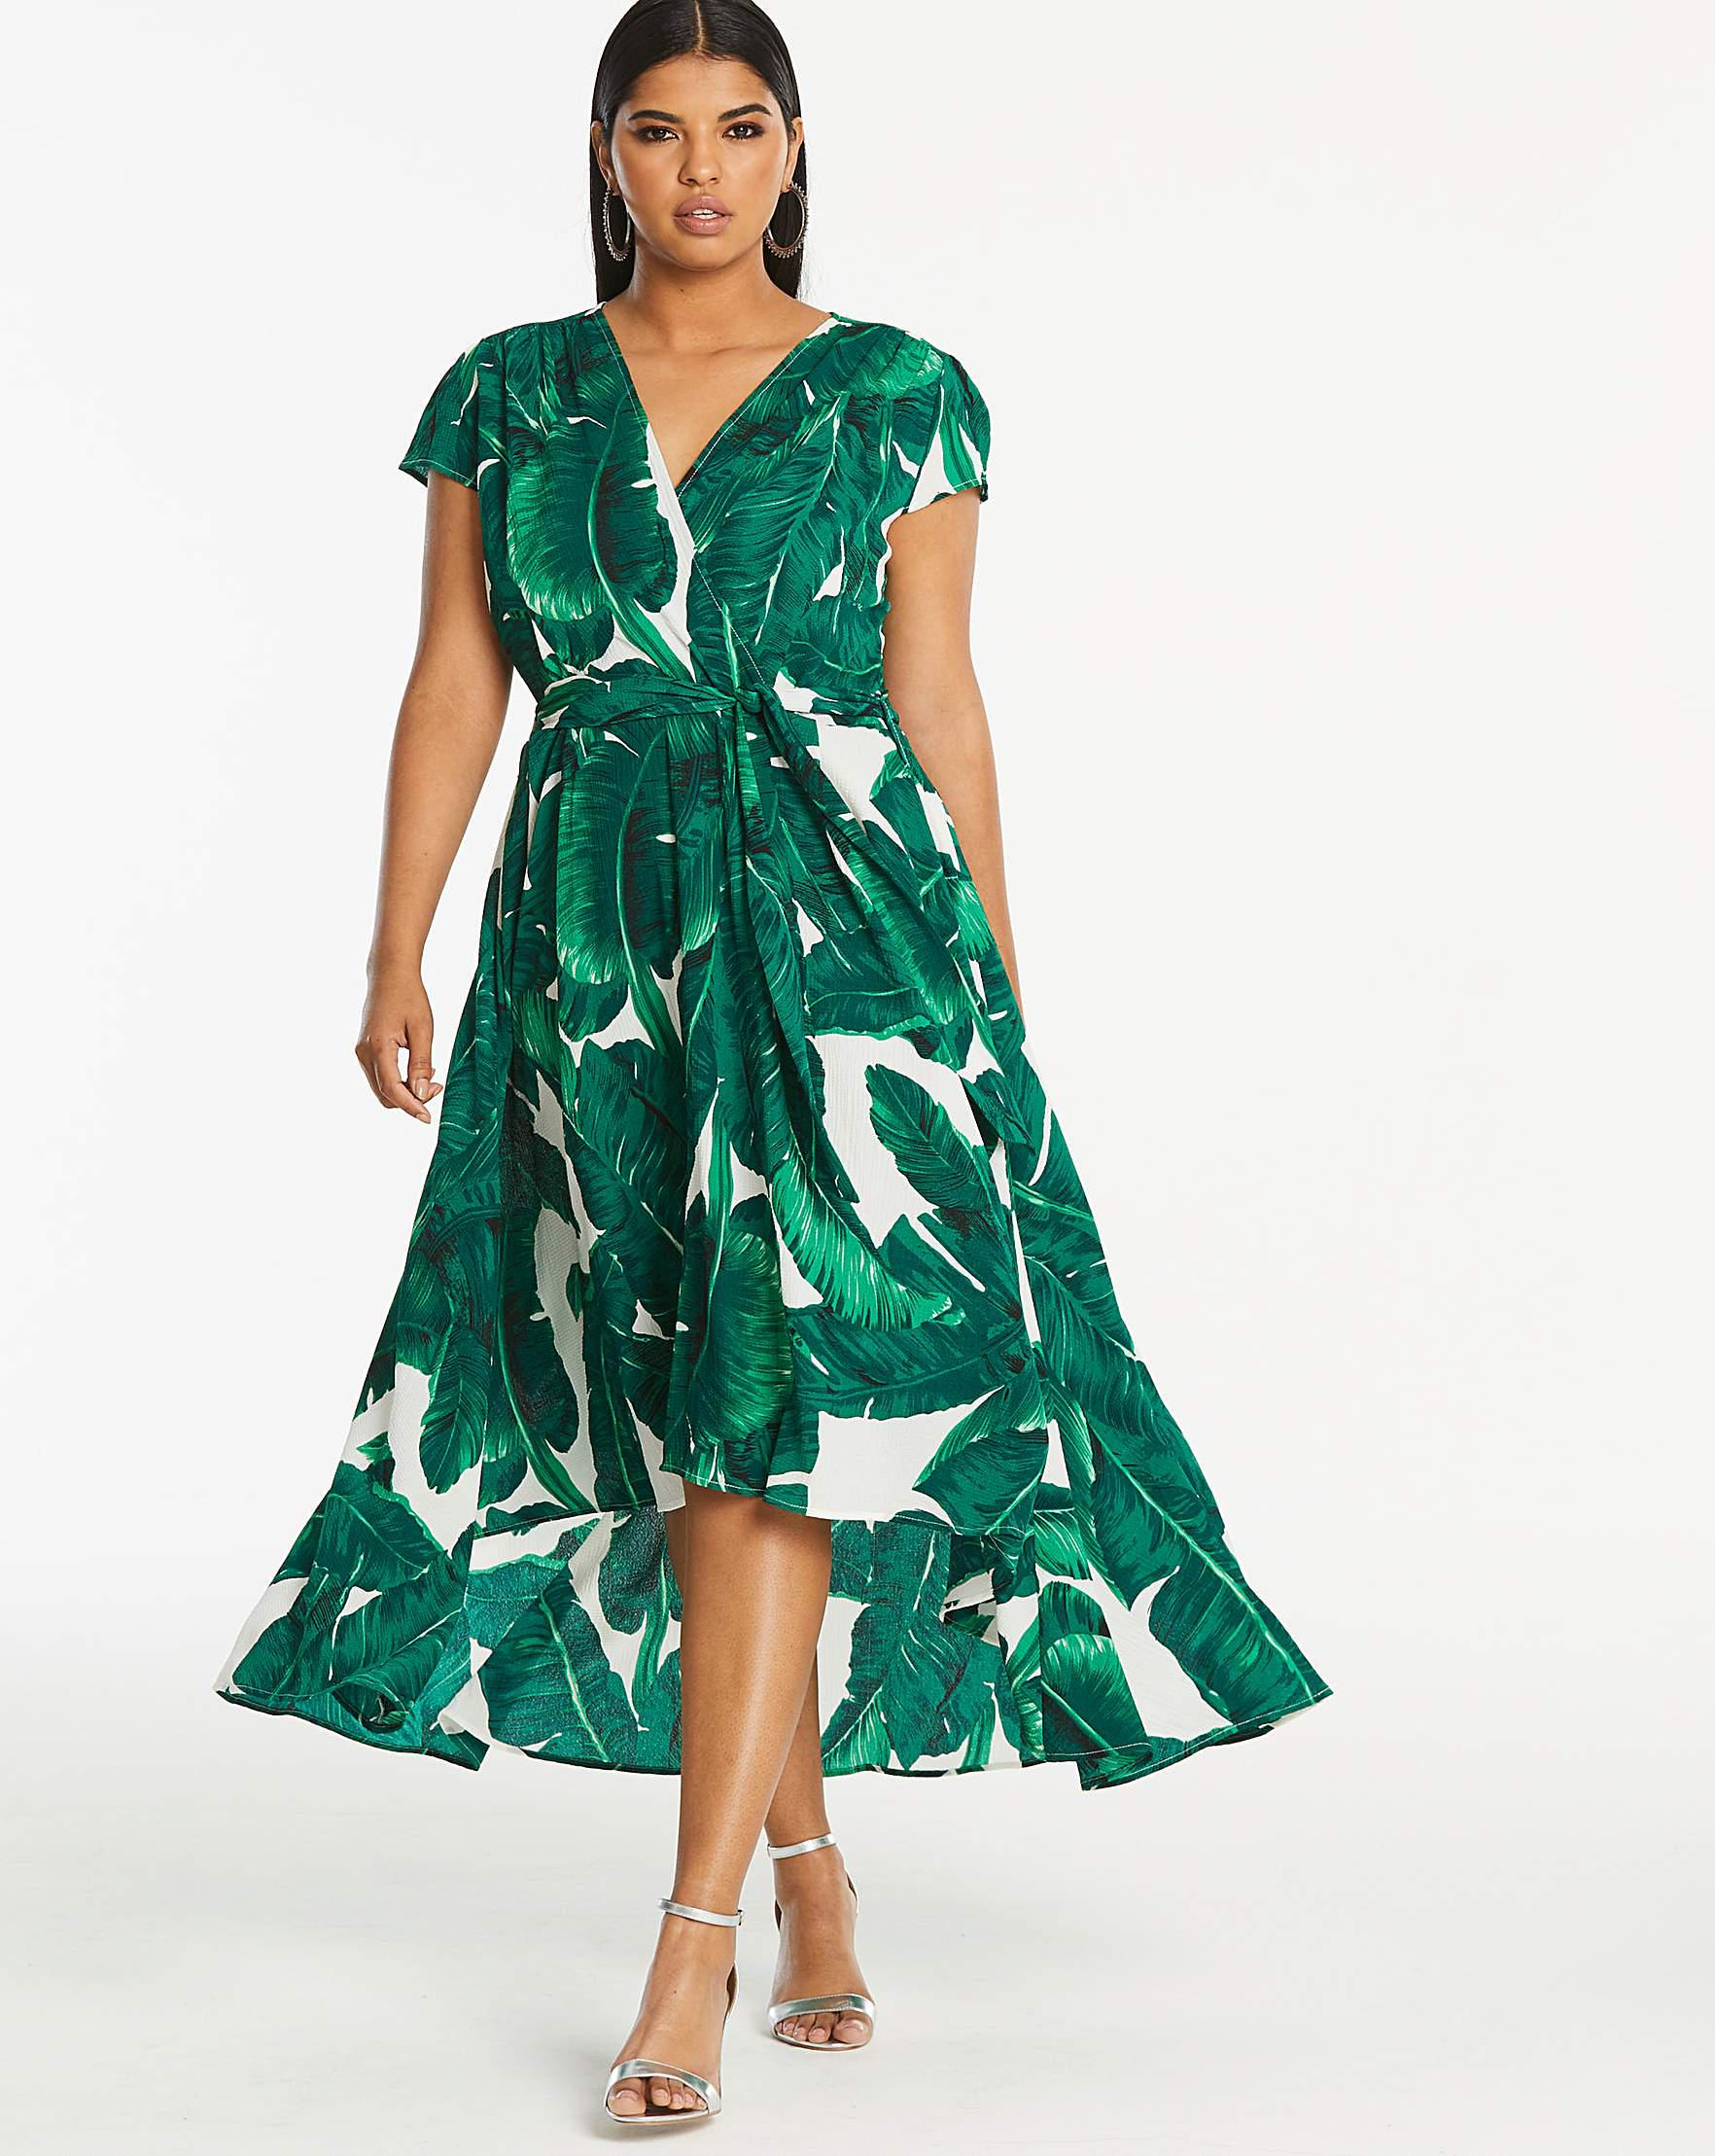 5970d2c979 AX Paris Curve Printed Dip Back Dress in Green - Lyst